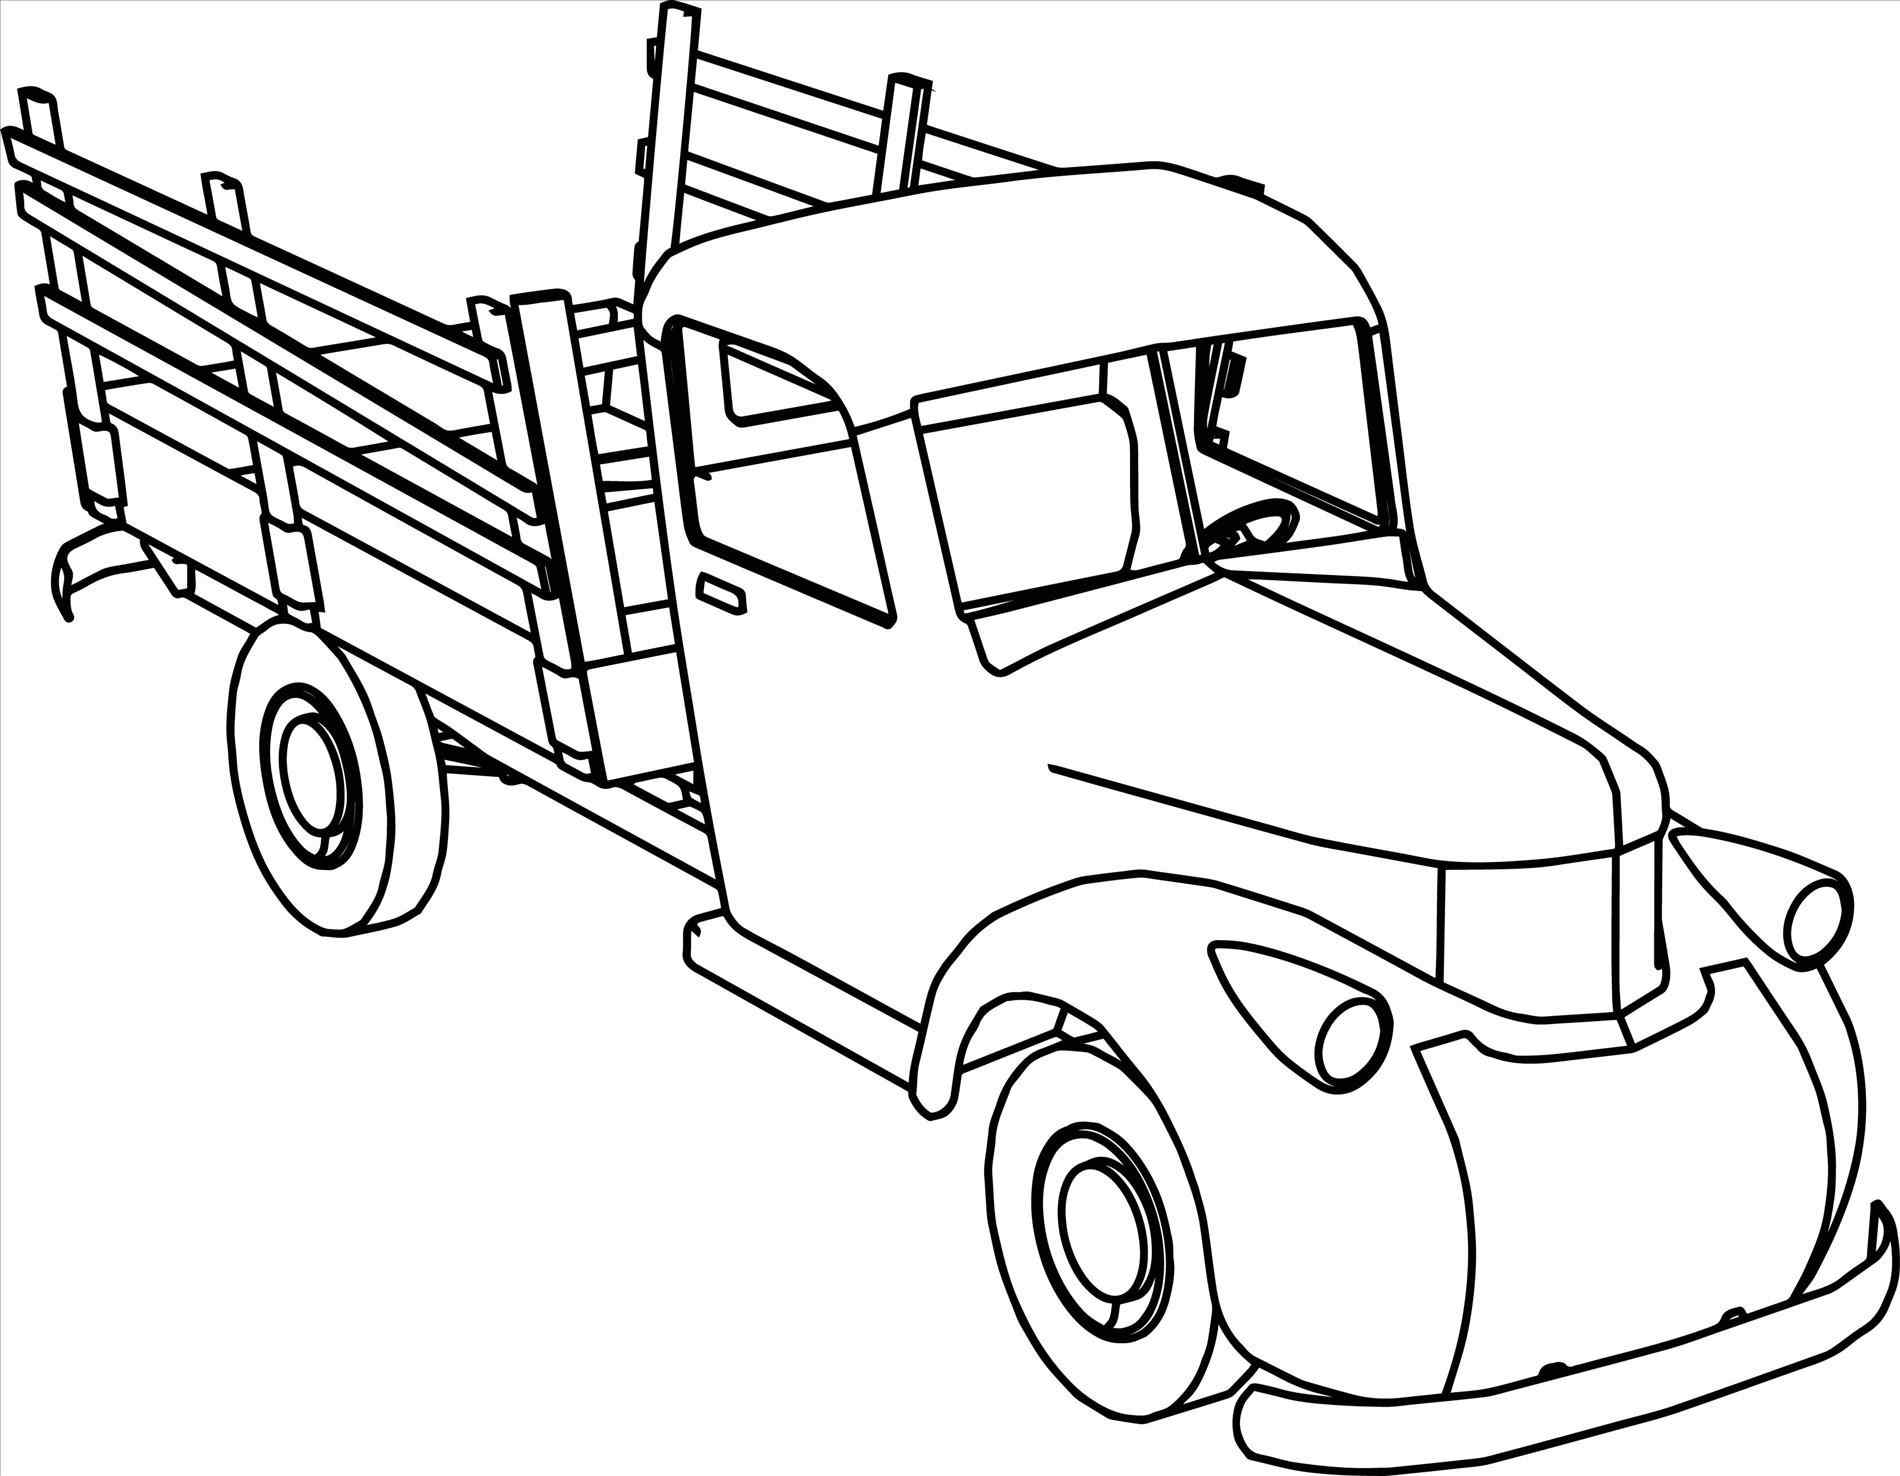 1900x1476 Rhgetscom Pickd Pickup Truck Drawing Up At Getscom Free